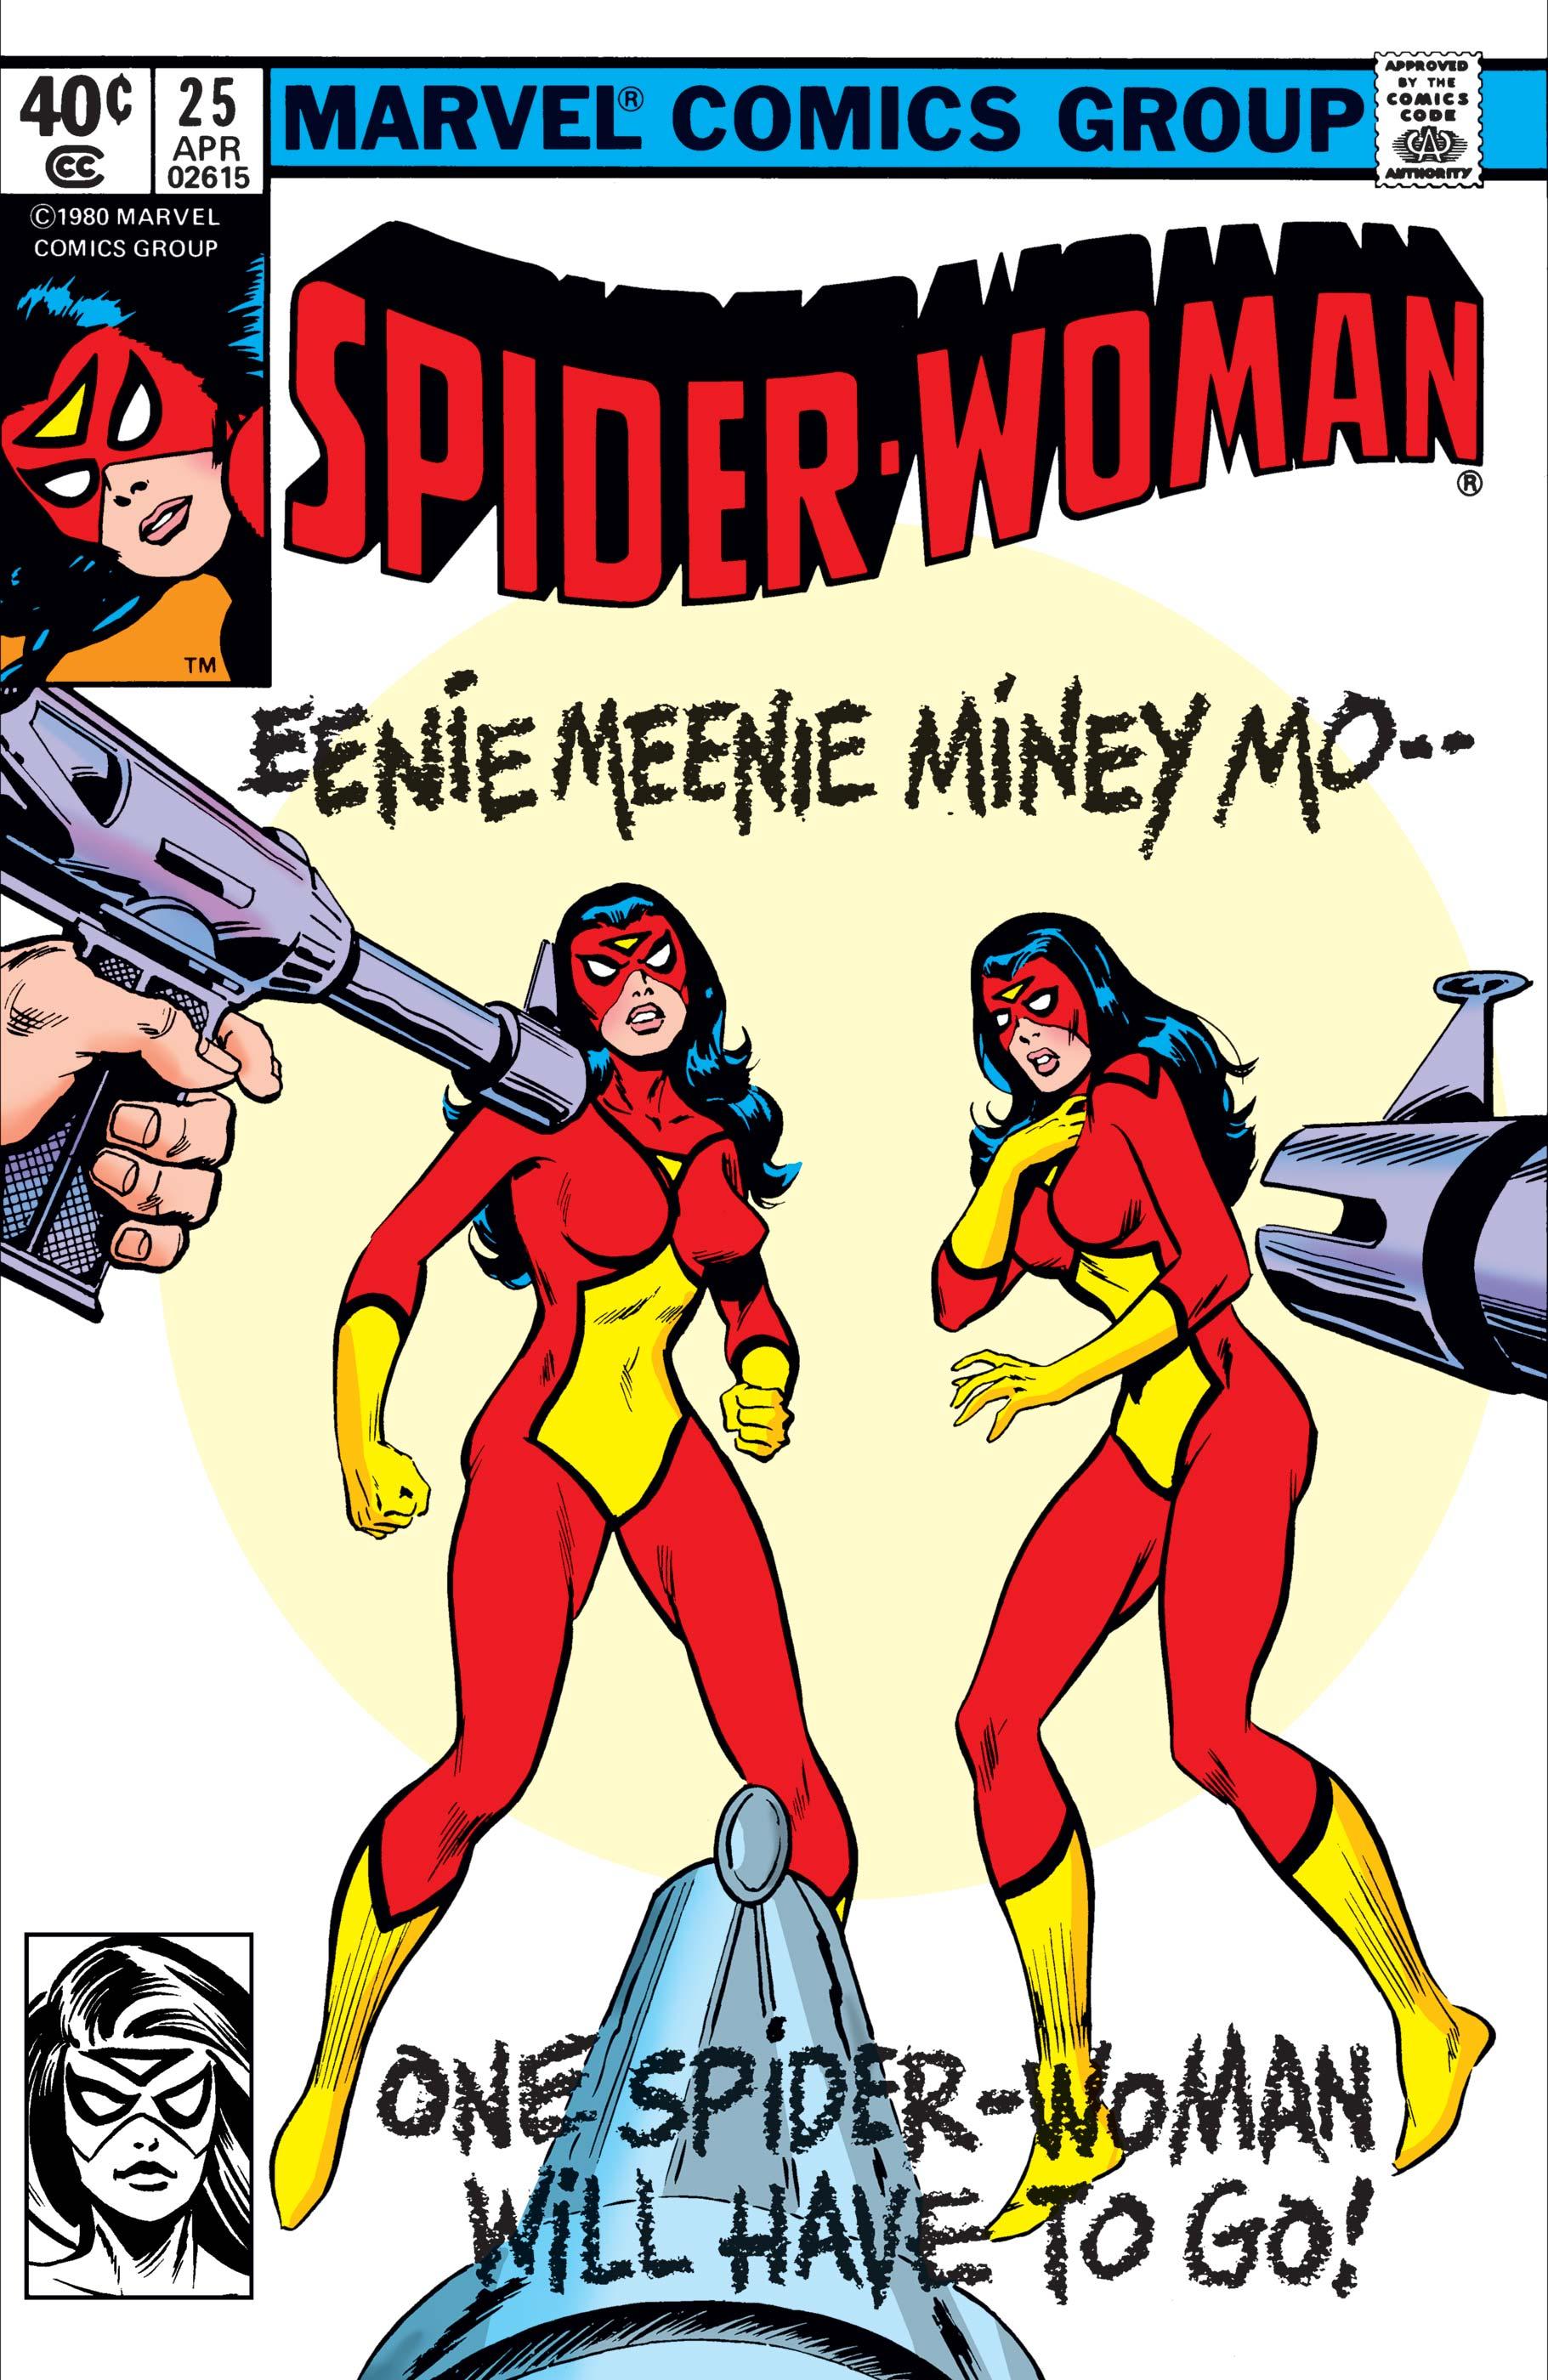 Spider-Woman (1978) #25